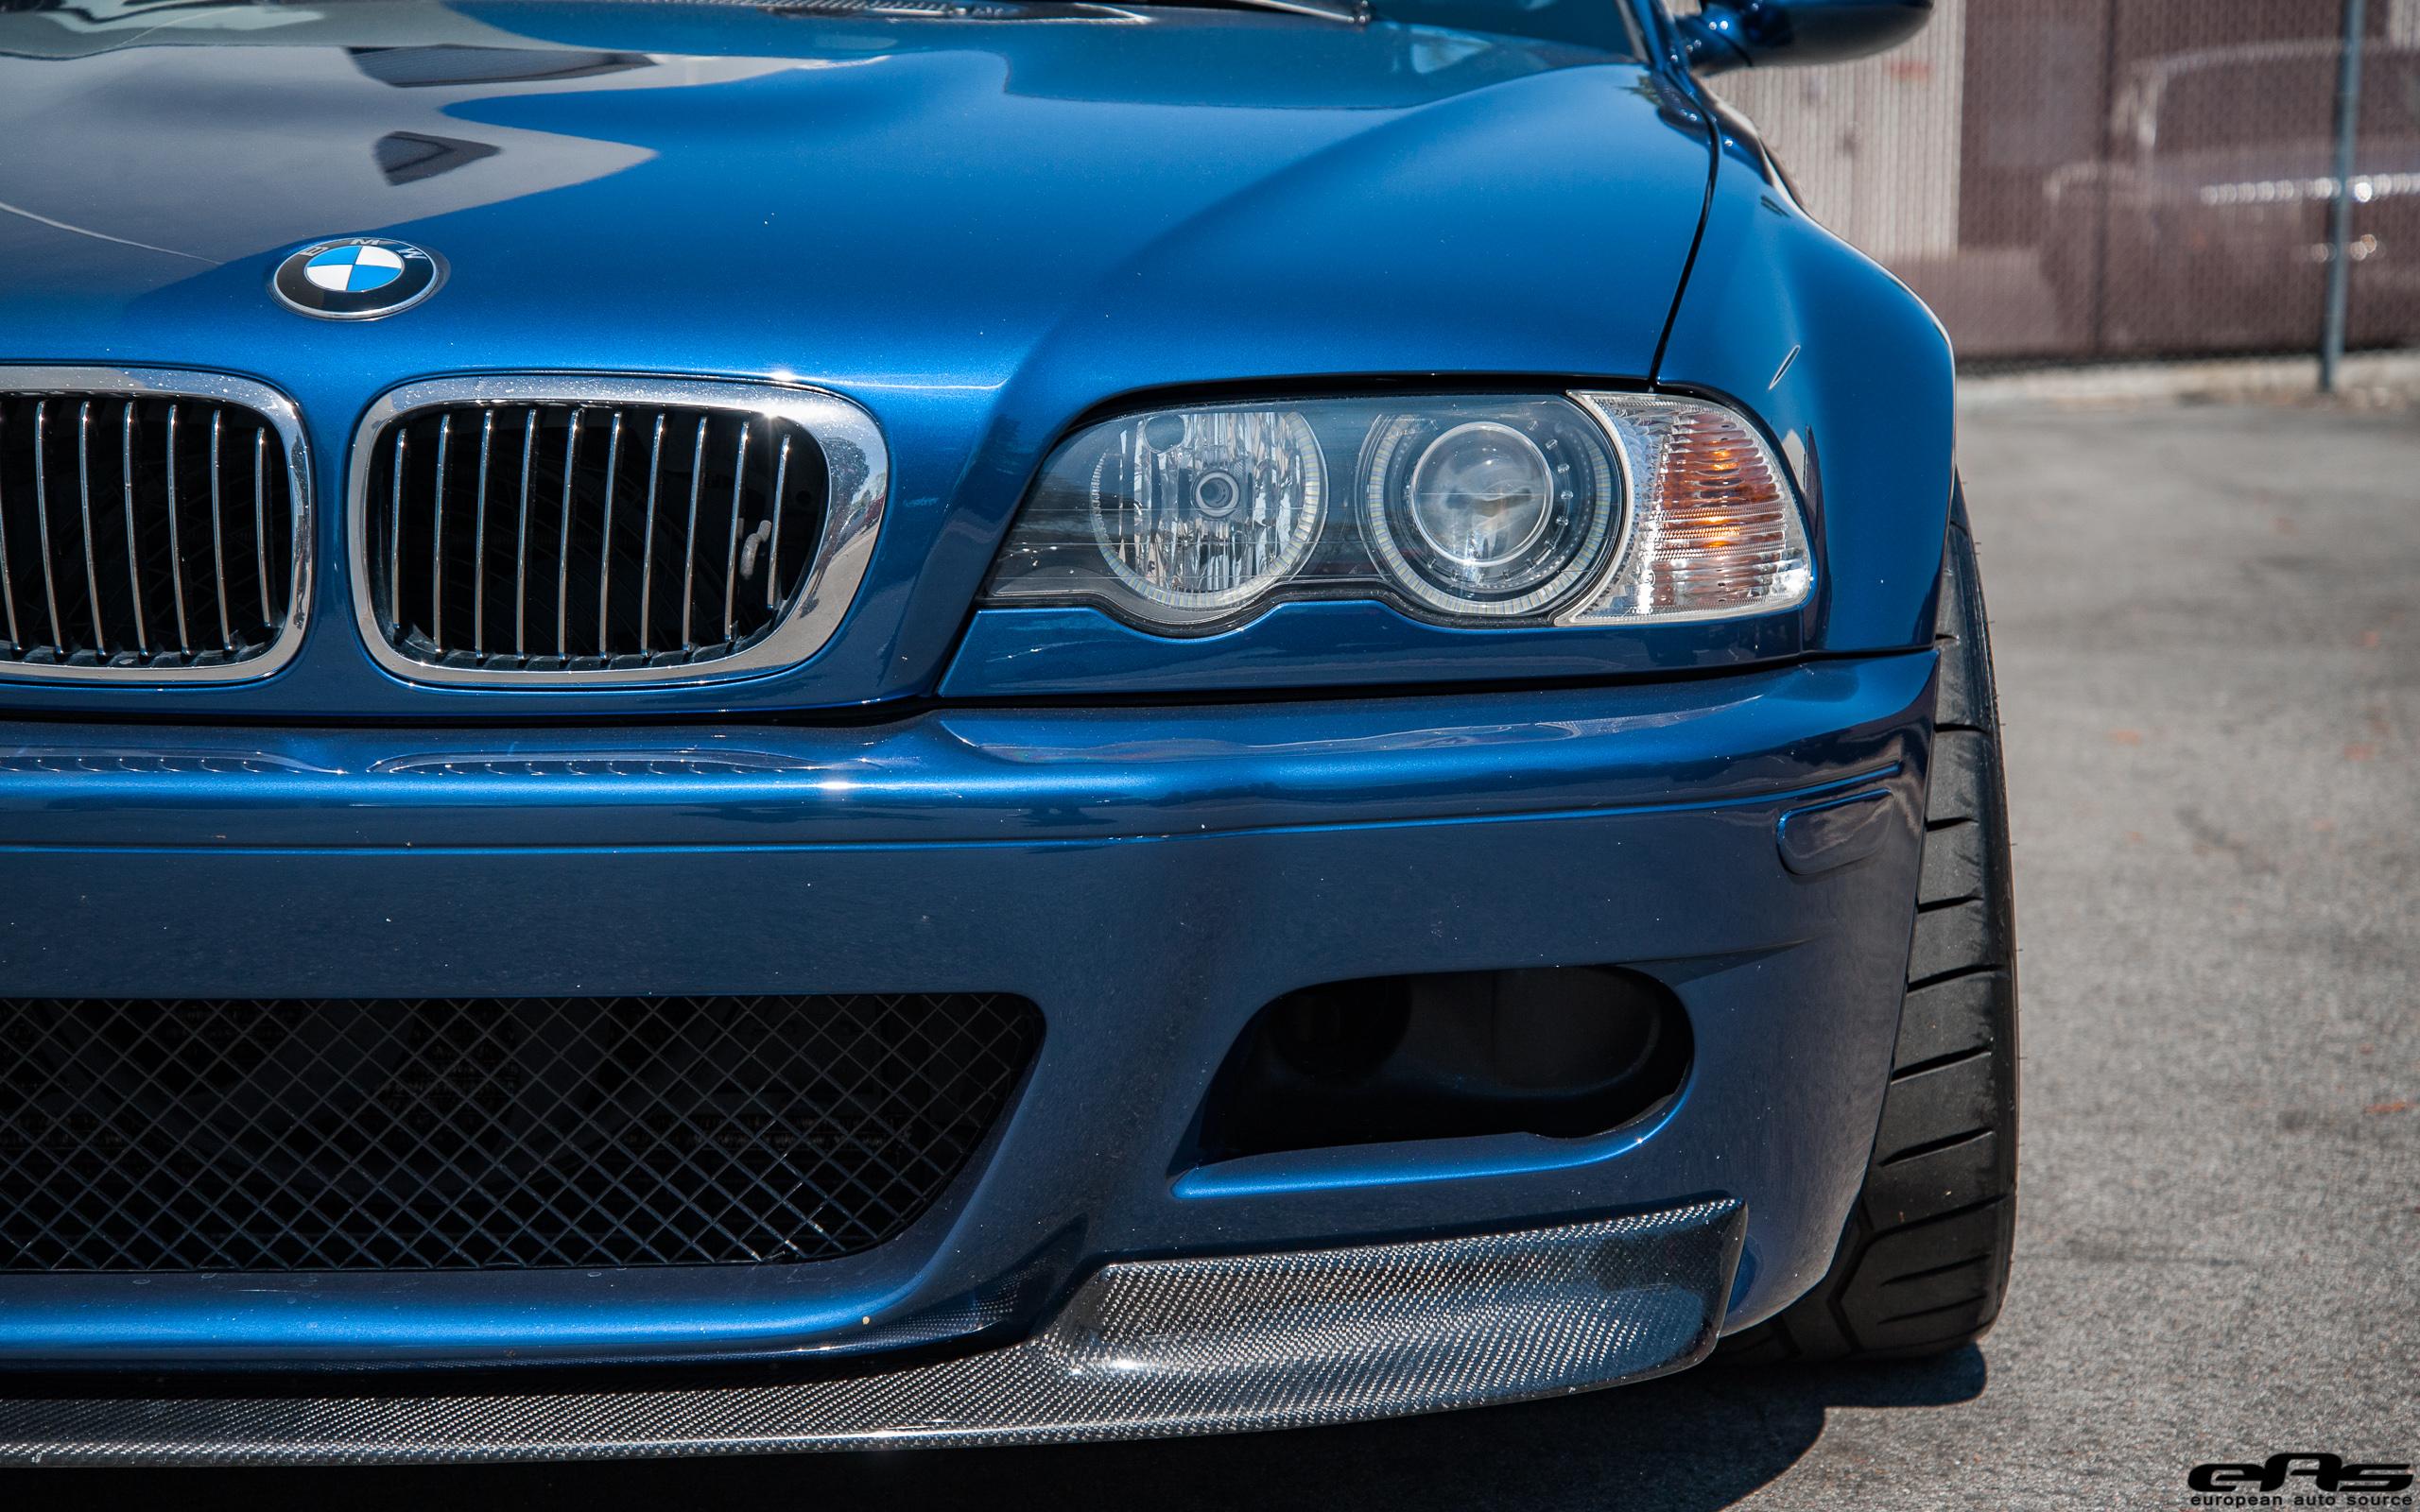 A Mystic Blue Bmw E46 M3 Gets Aftermarket Goodies At European Auto